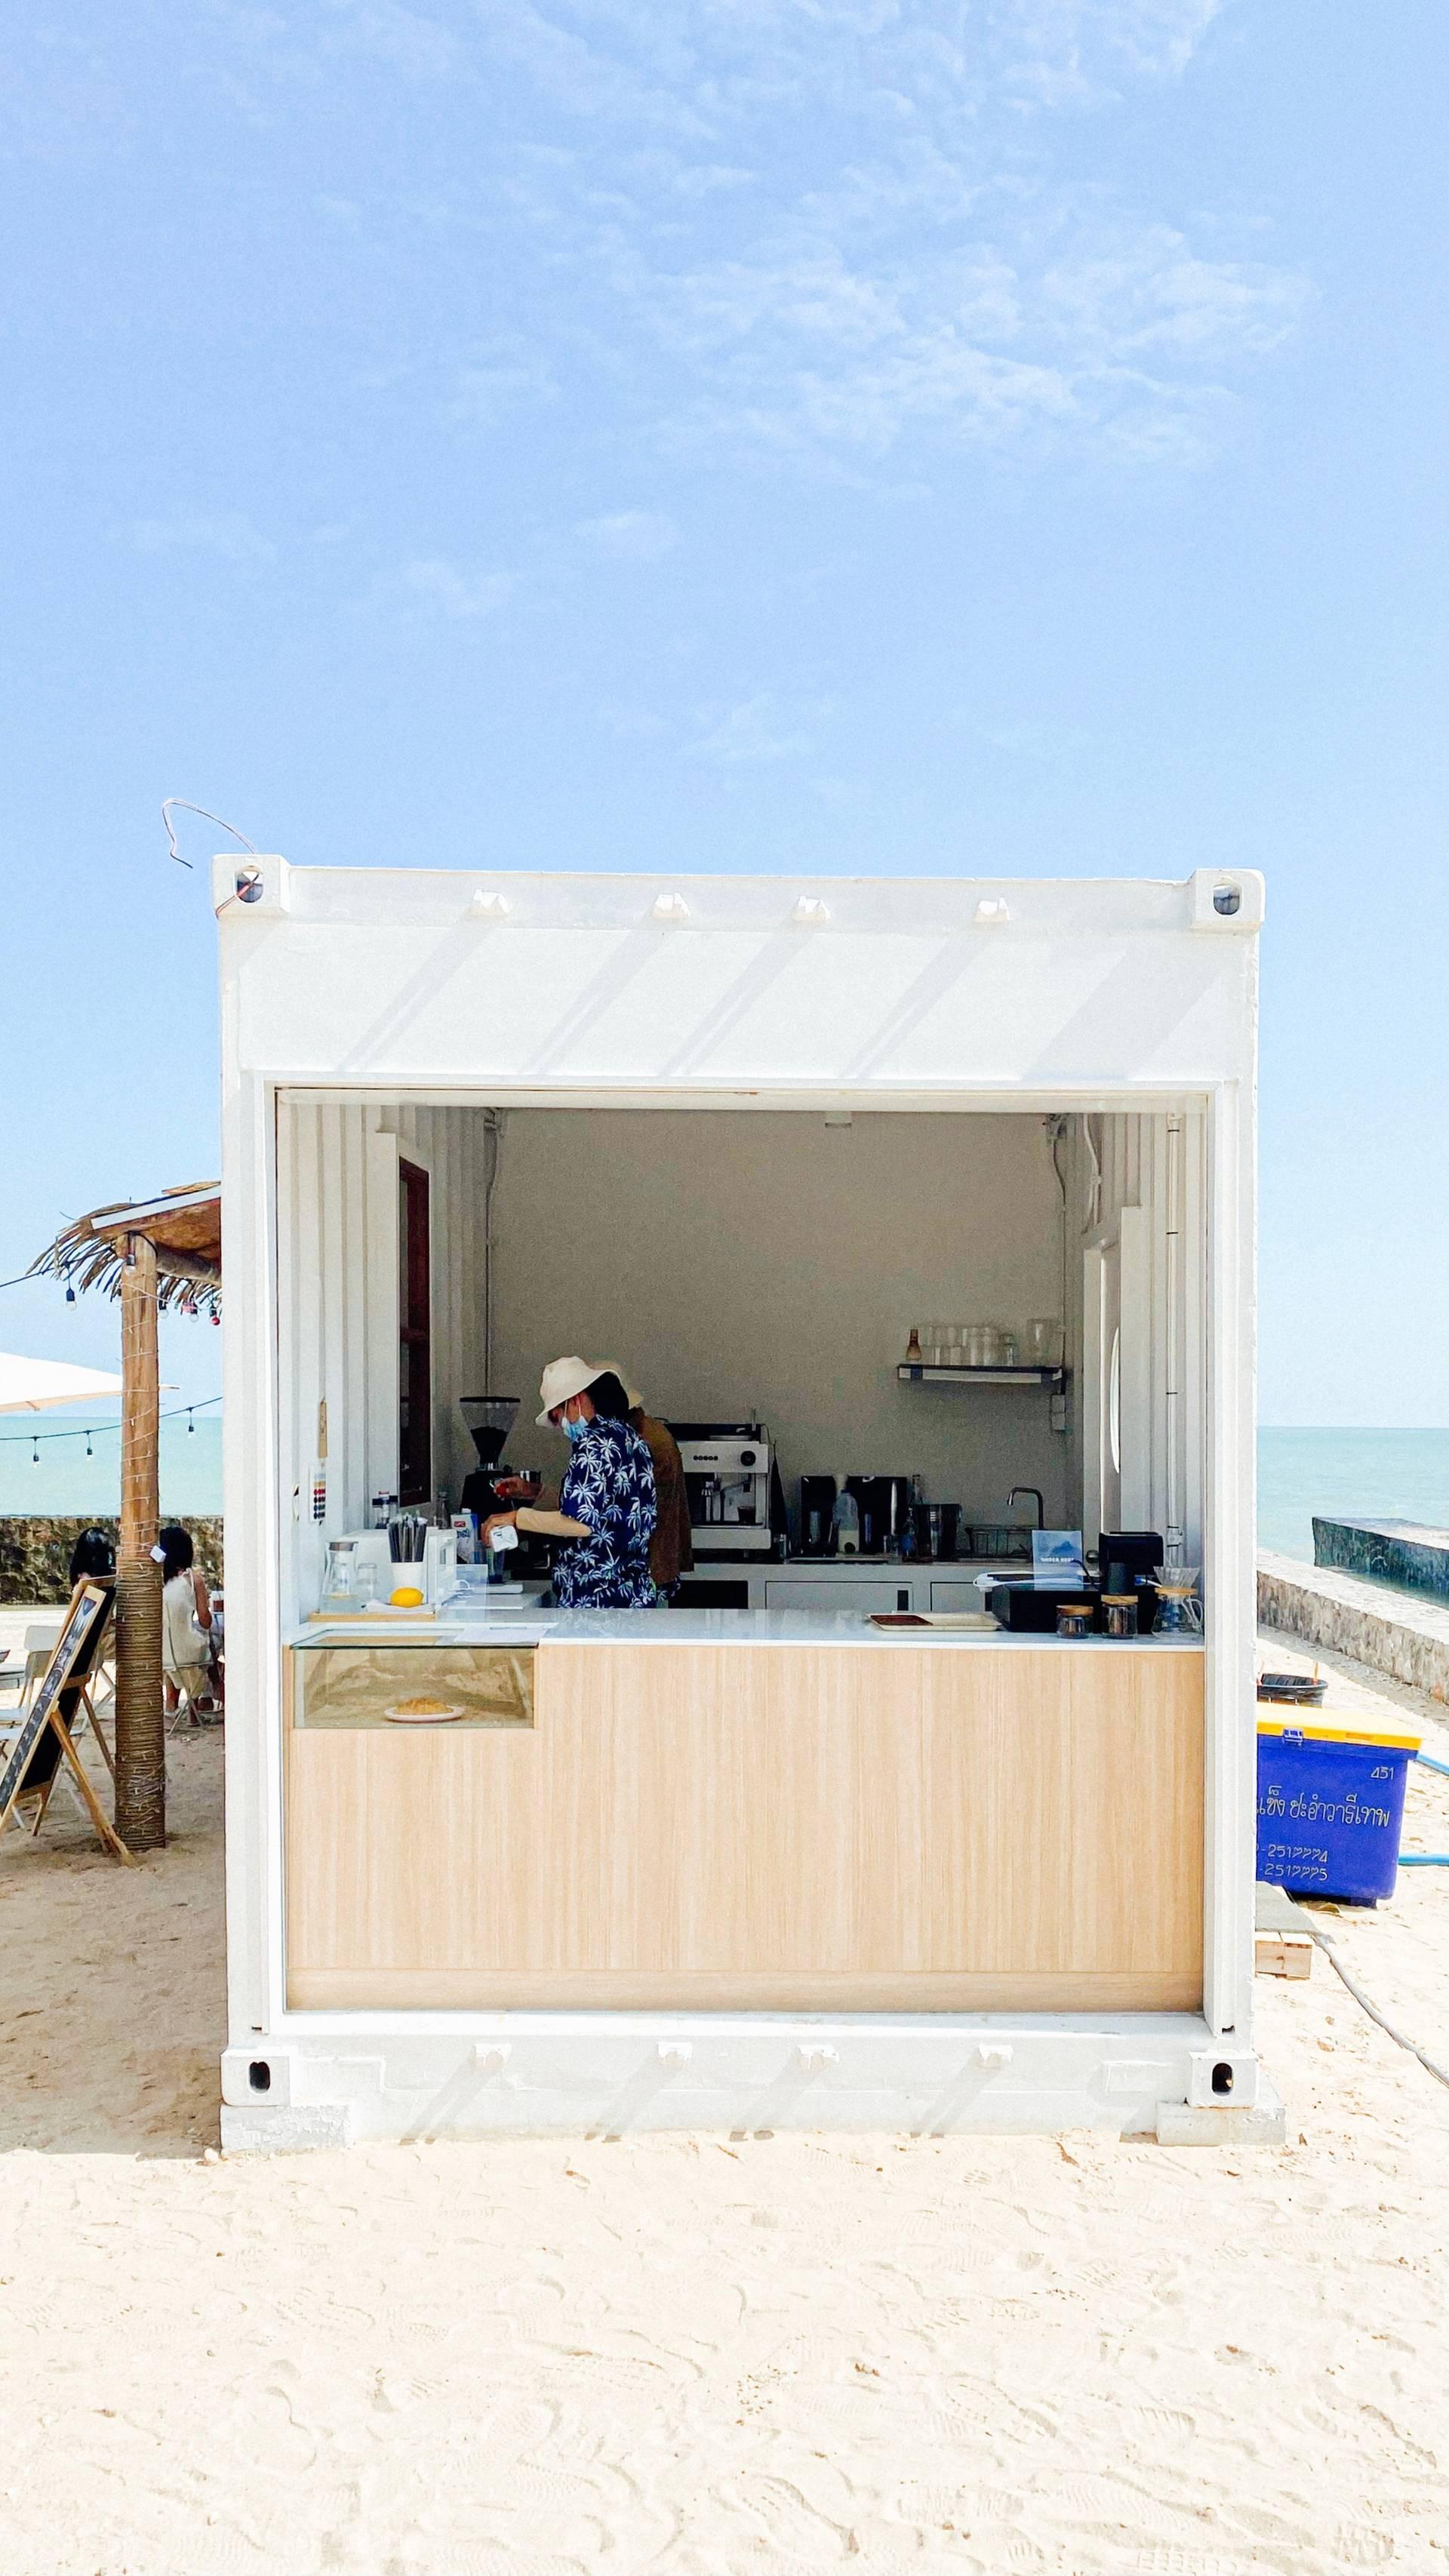 Tumlay Cafe&Bar